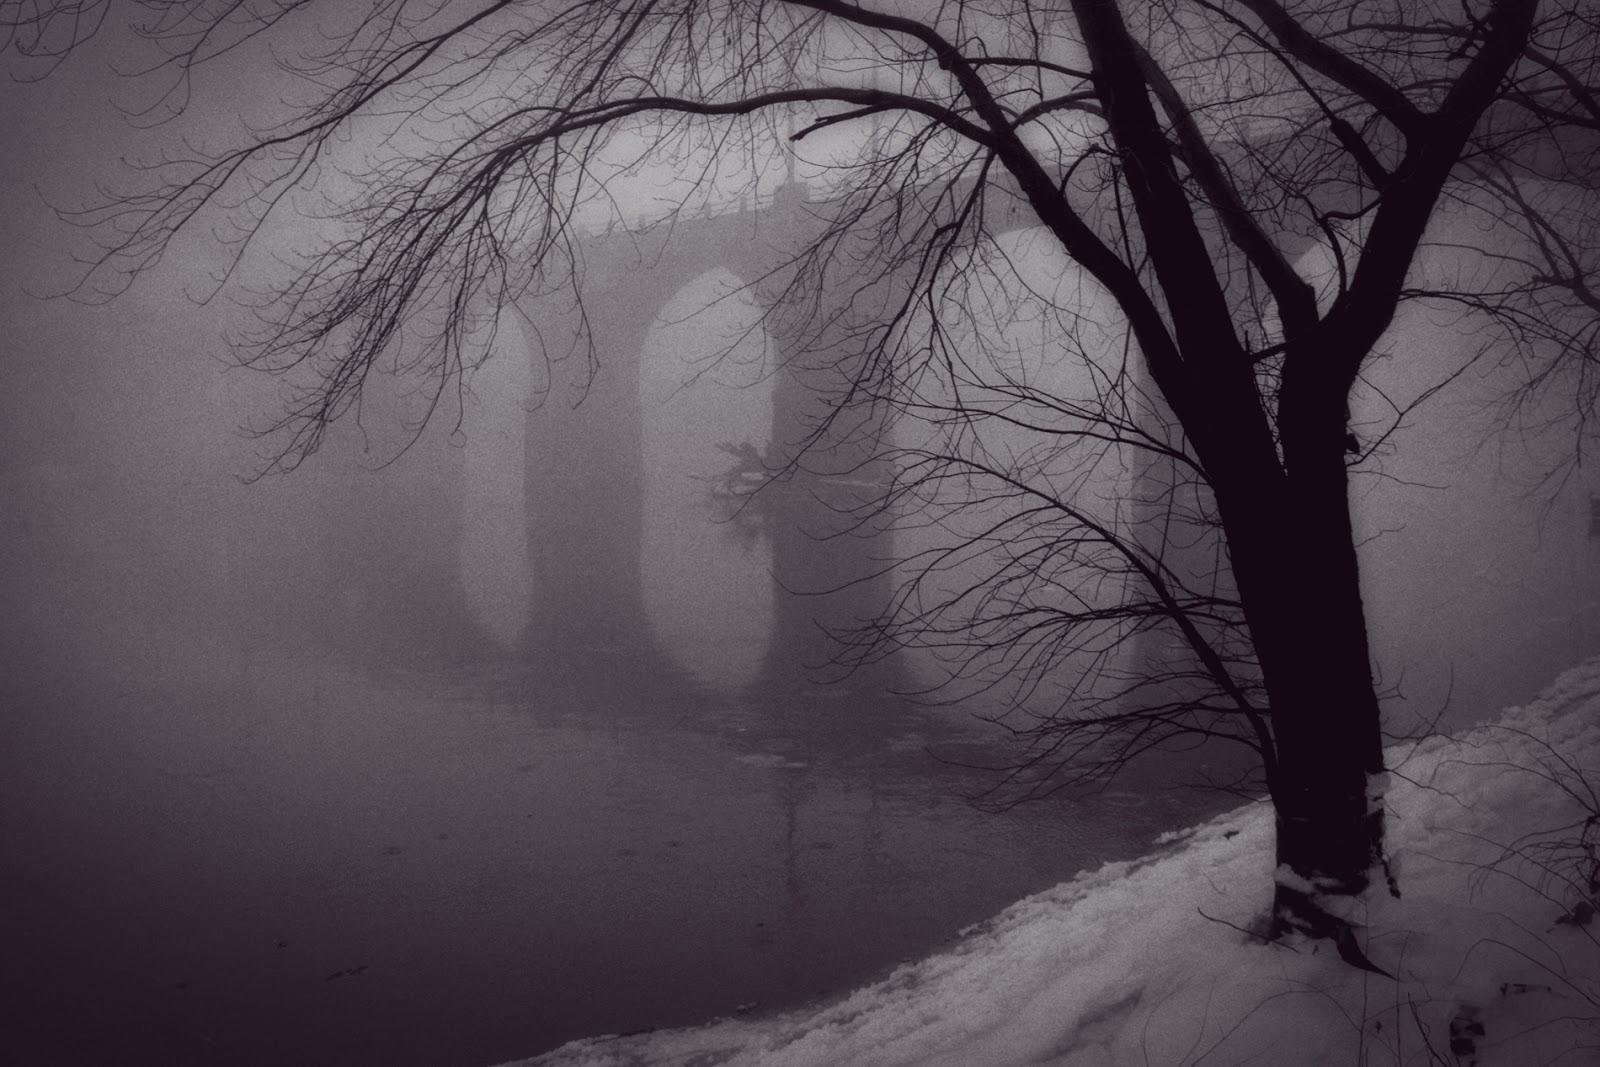 Josh friedman photography ice snow and fog black and white